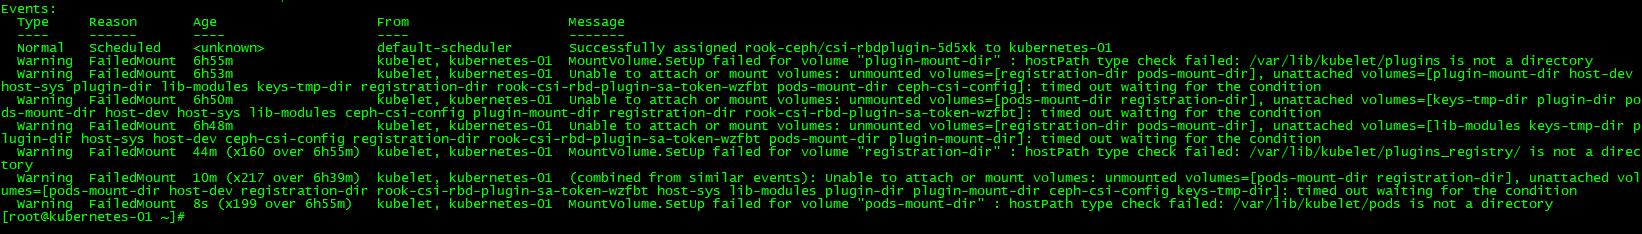 Rook快速编排Kubernetes分布式存储Ceph